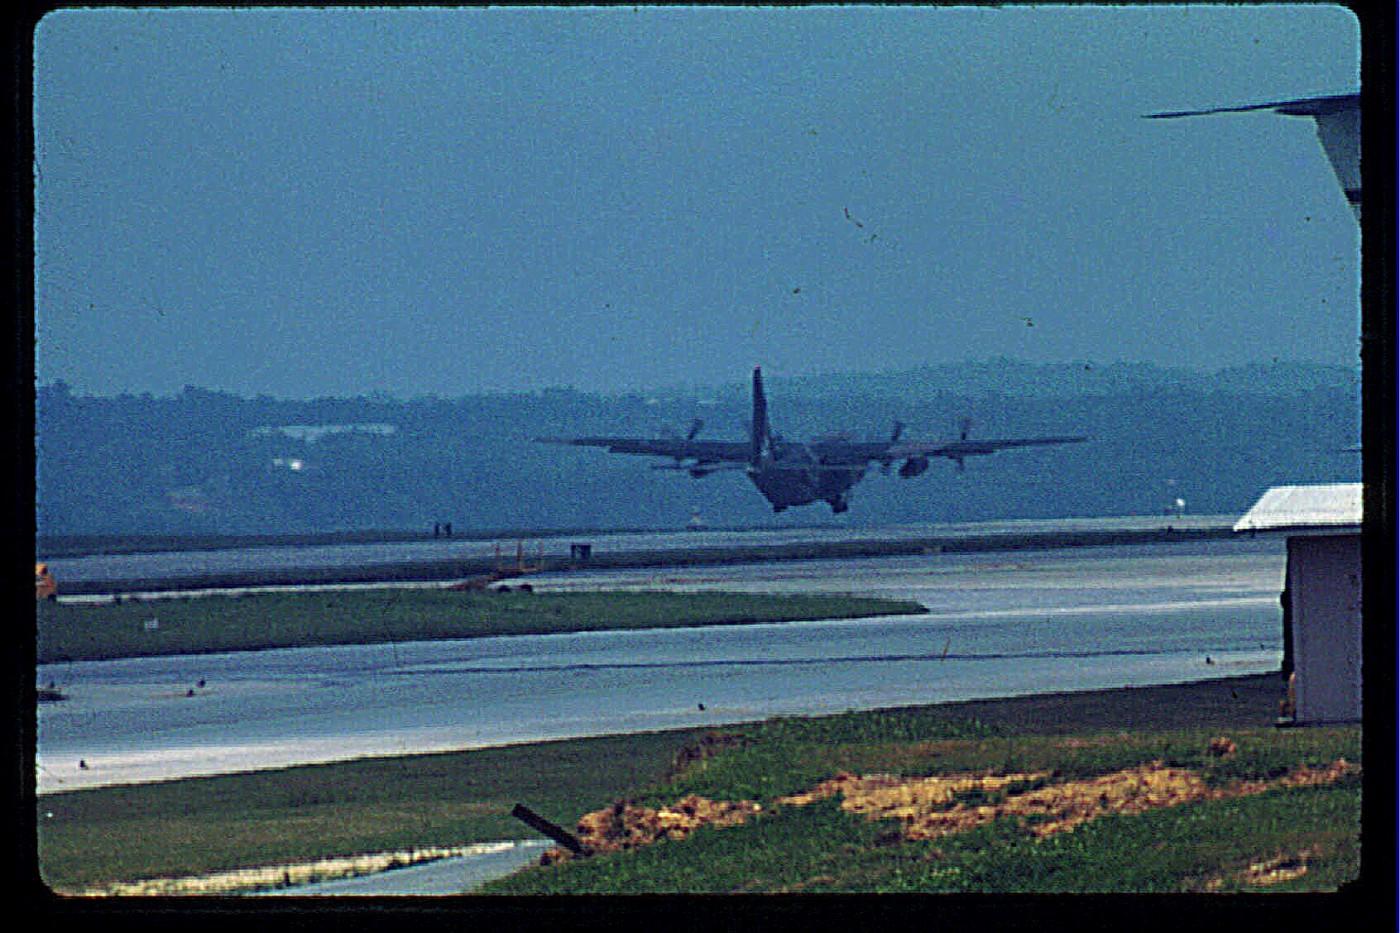 Okinawa - 109